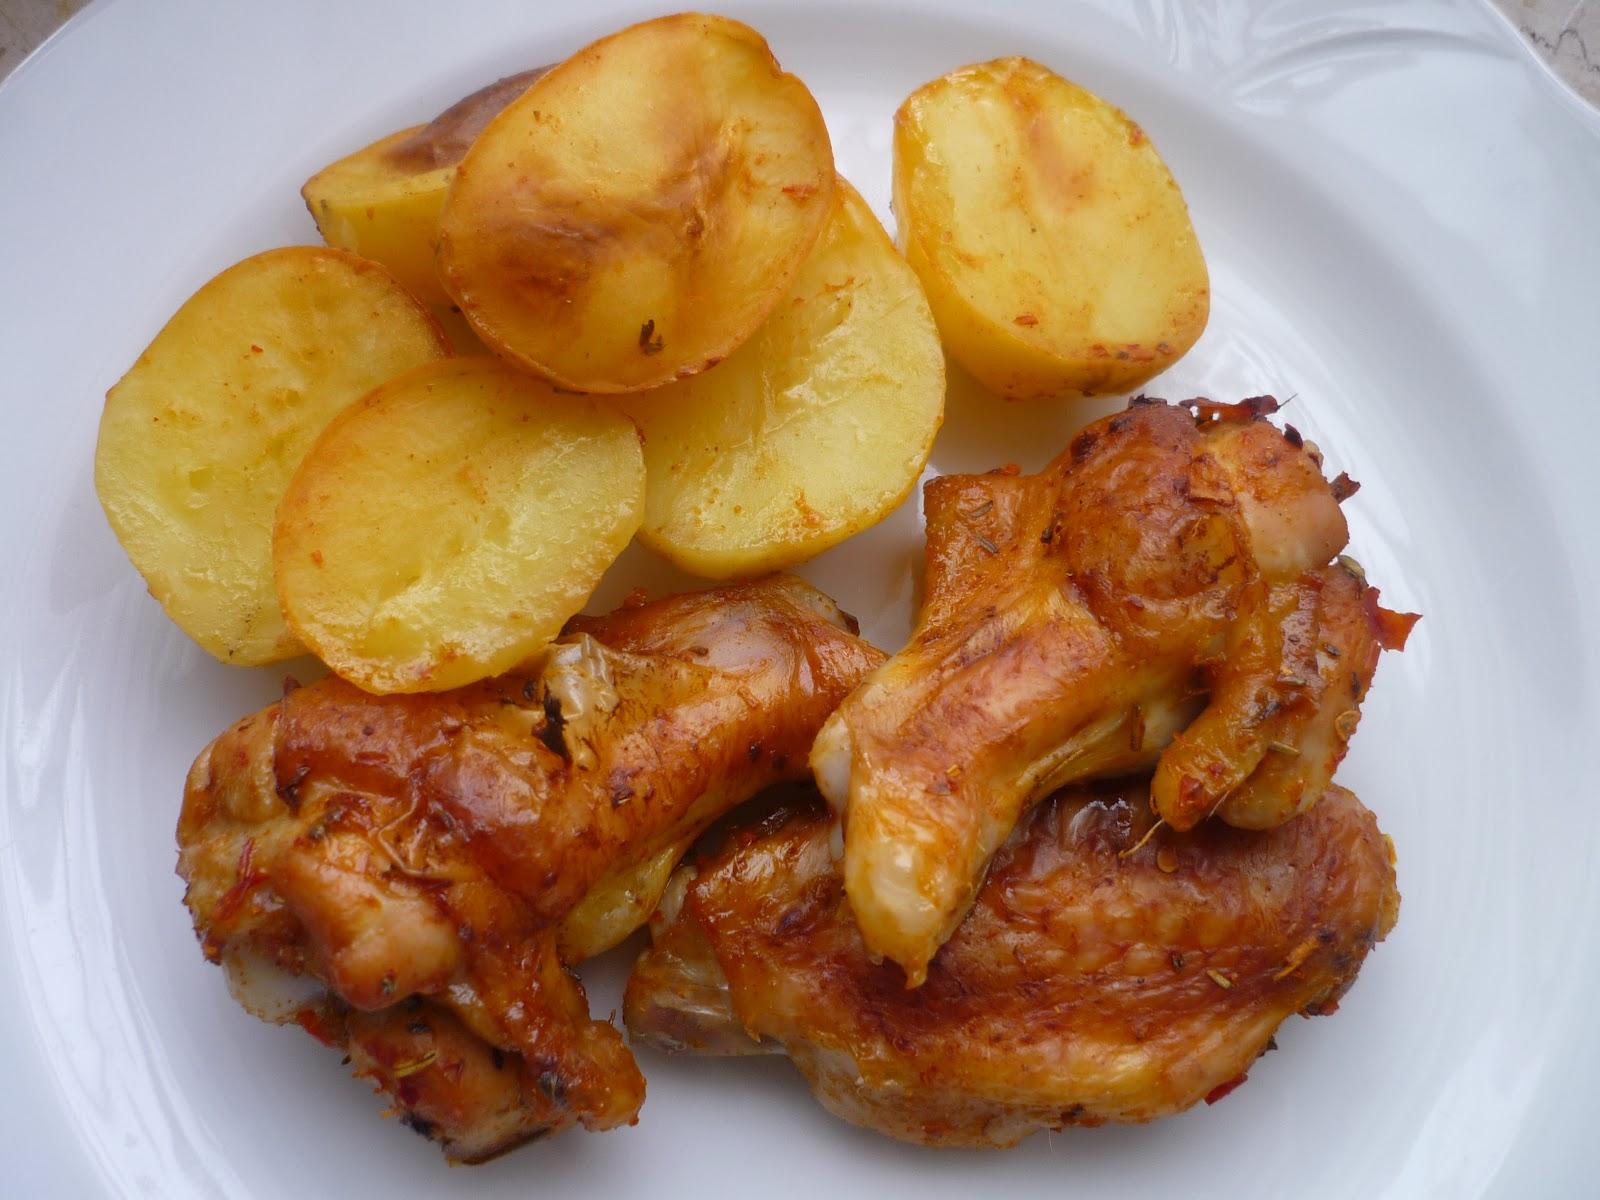 Fırında Tavuk Tarifi – Tavuklu Tarifler